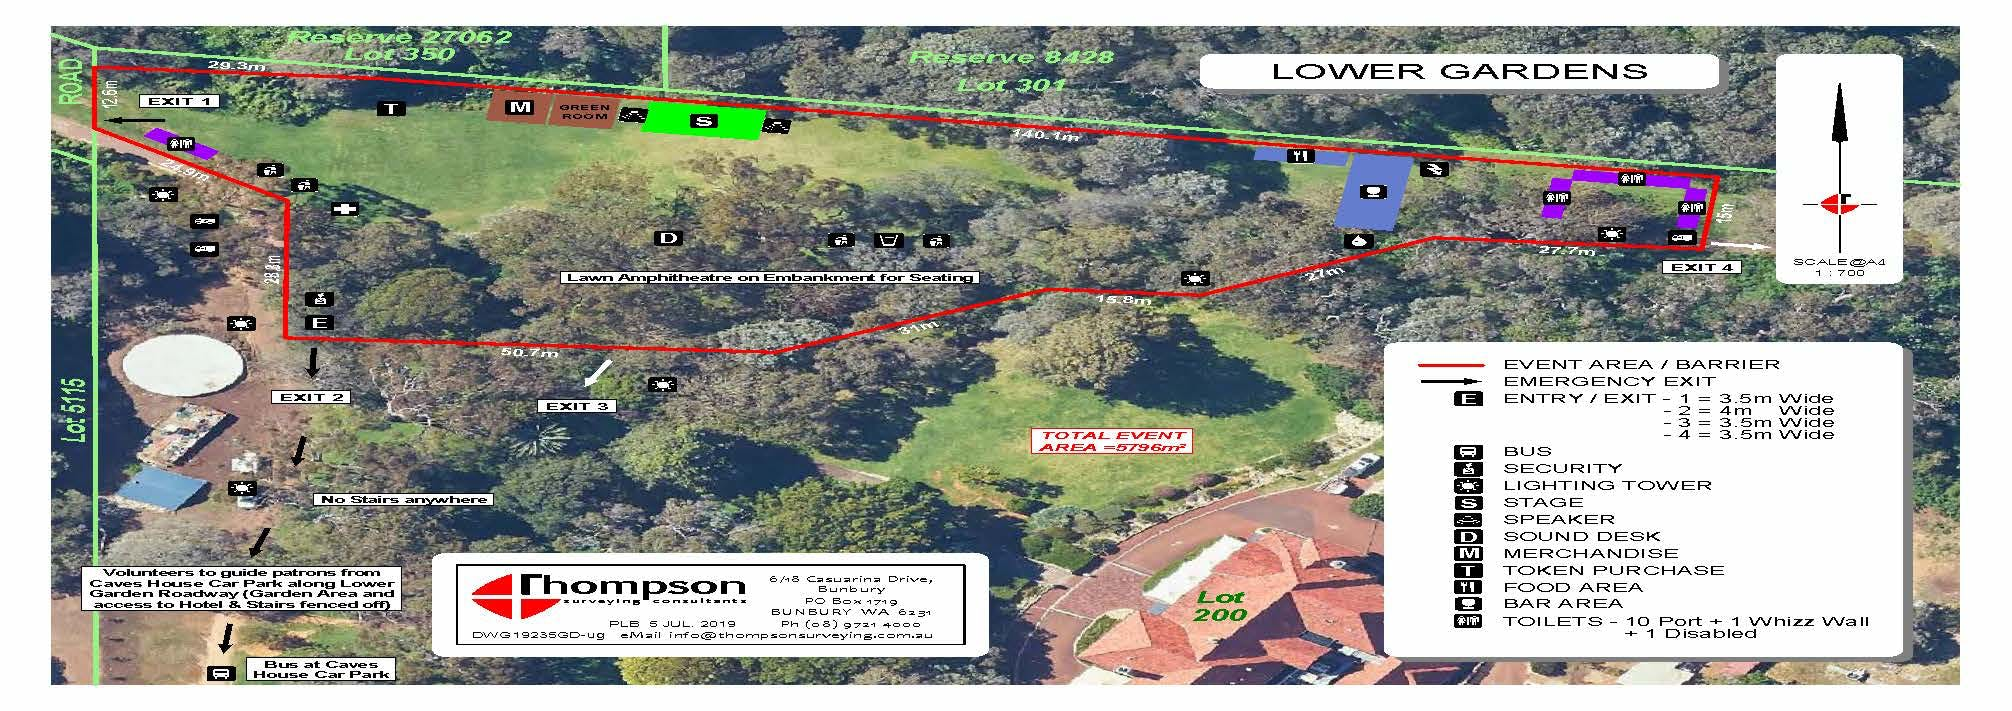 Event Area 3-Lower Gardens (002).jpg